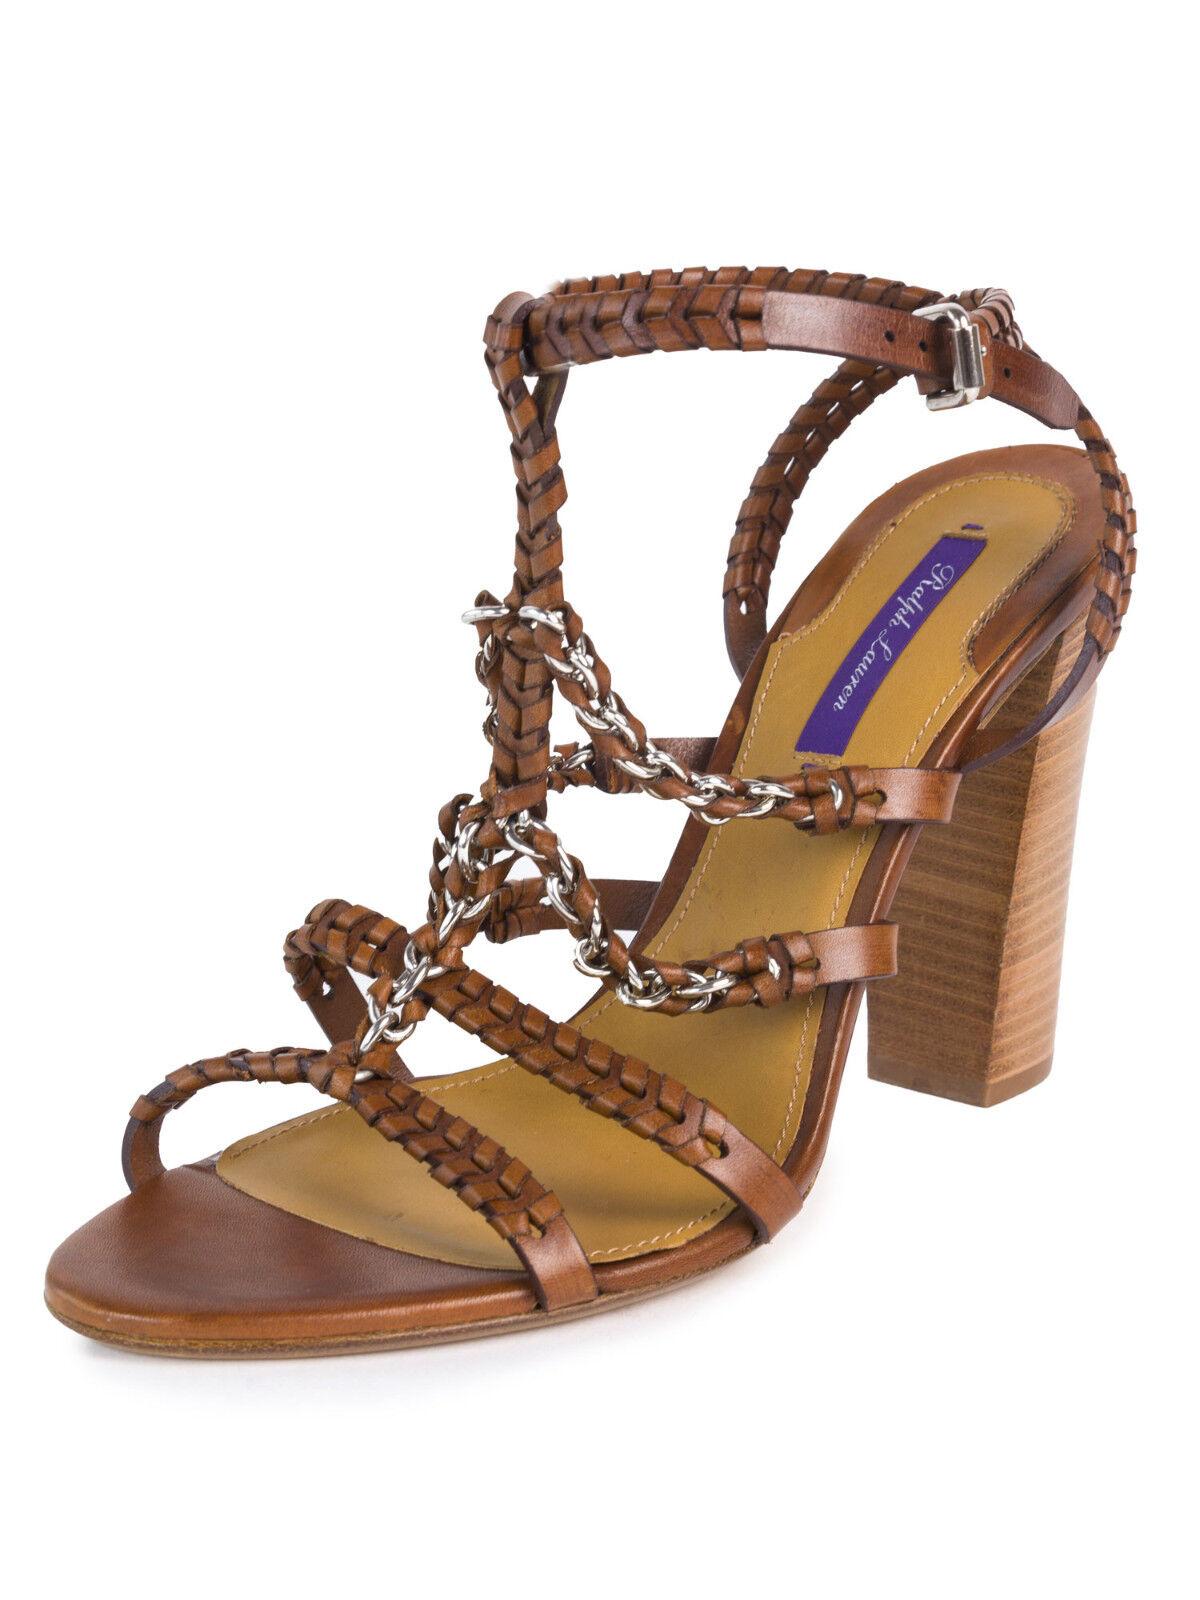 RALPH LAUREN Purple Label Brown Stacked Heel Braided Sandals Sz 10  575 NEW